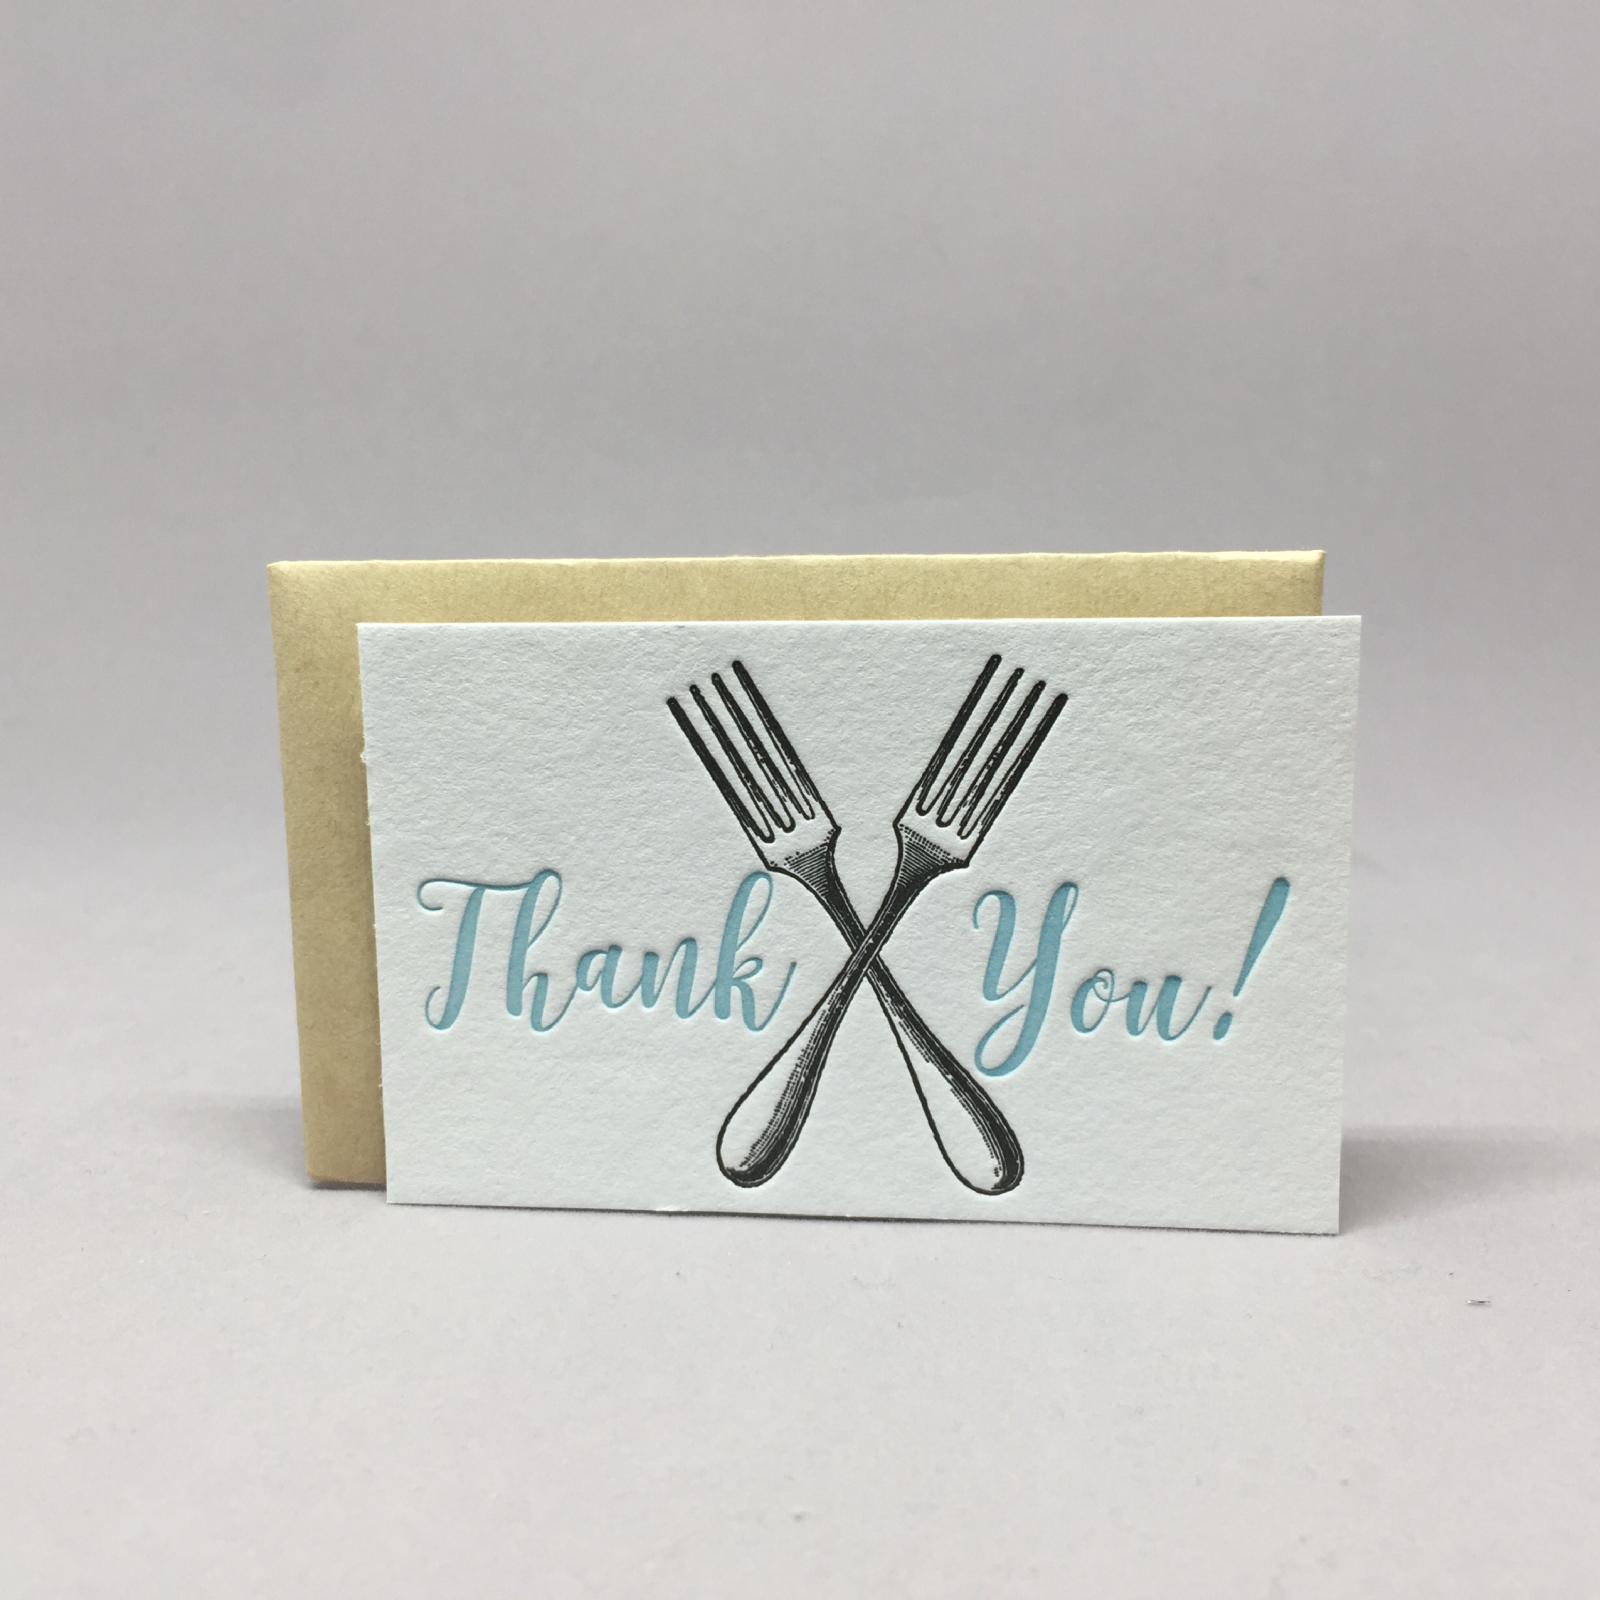 Thank You Forks Mini